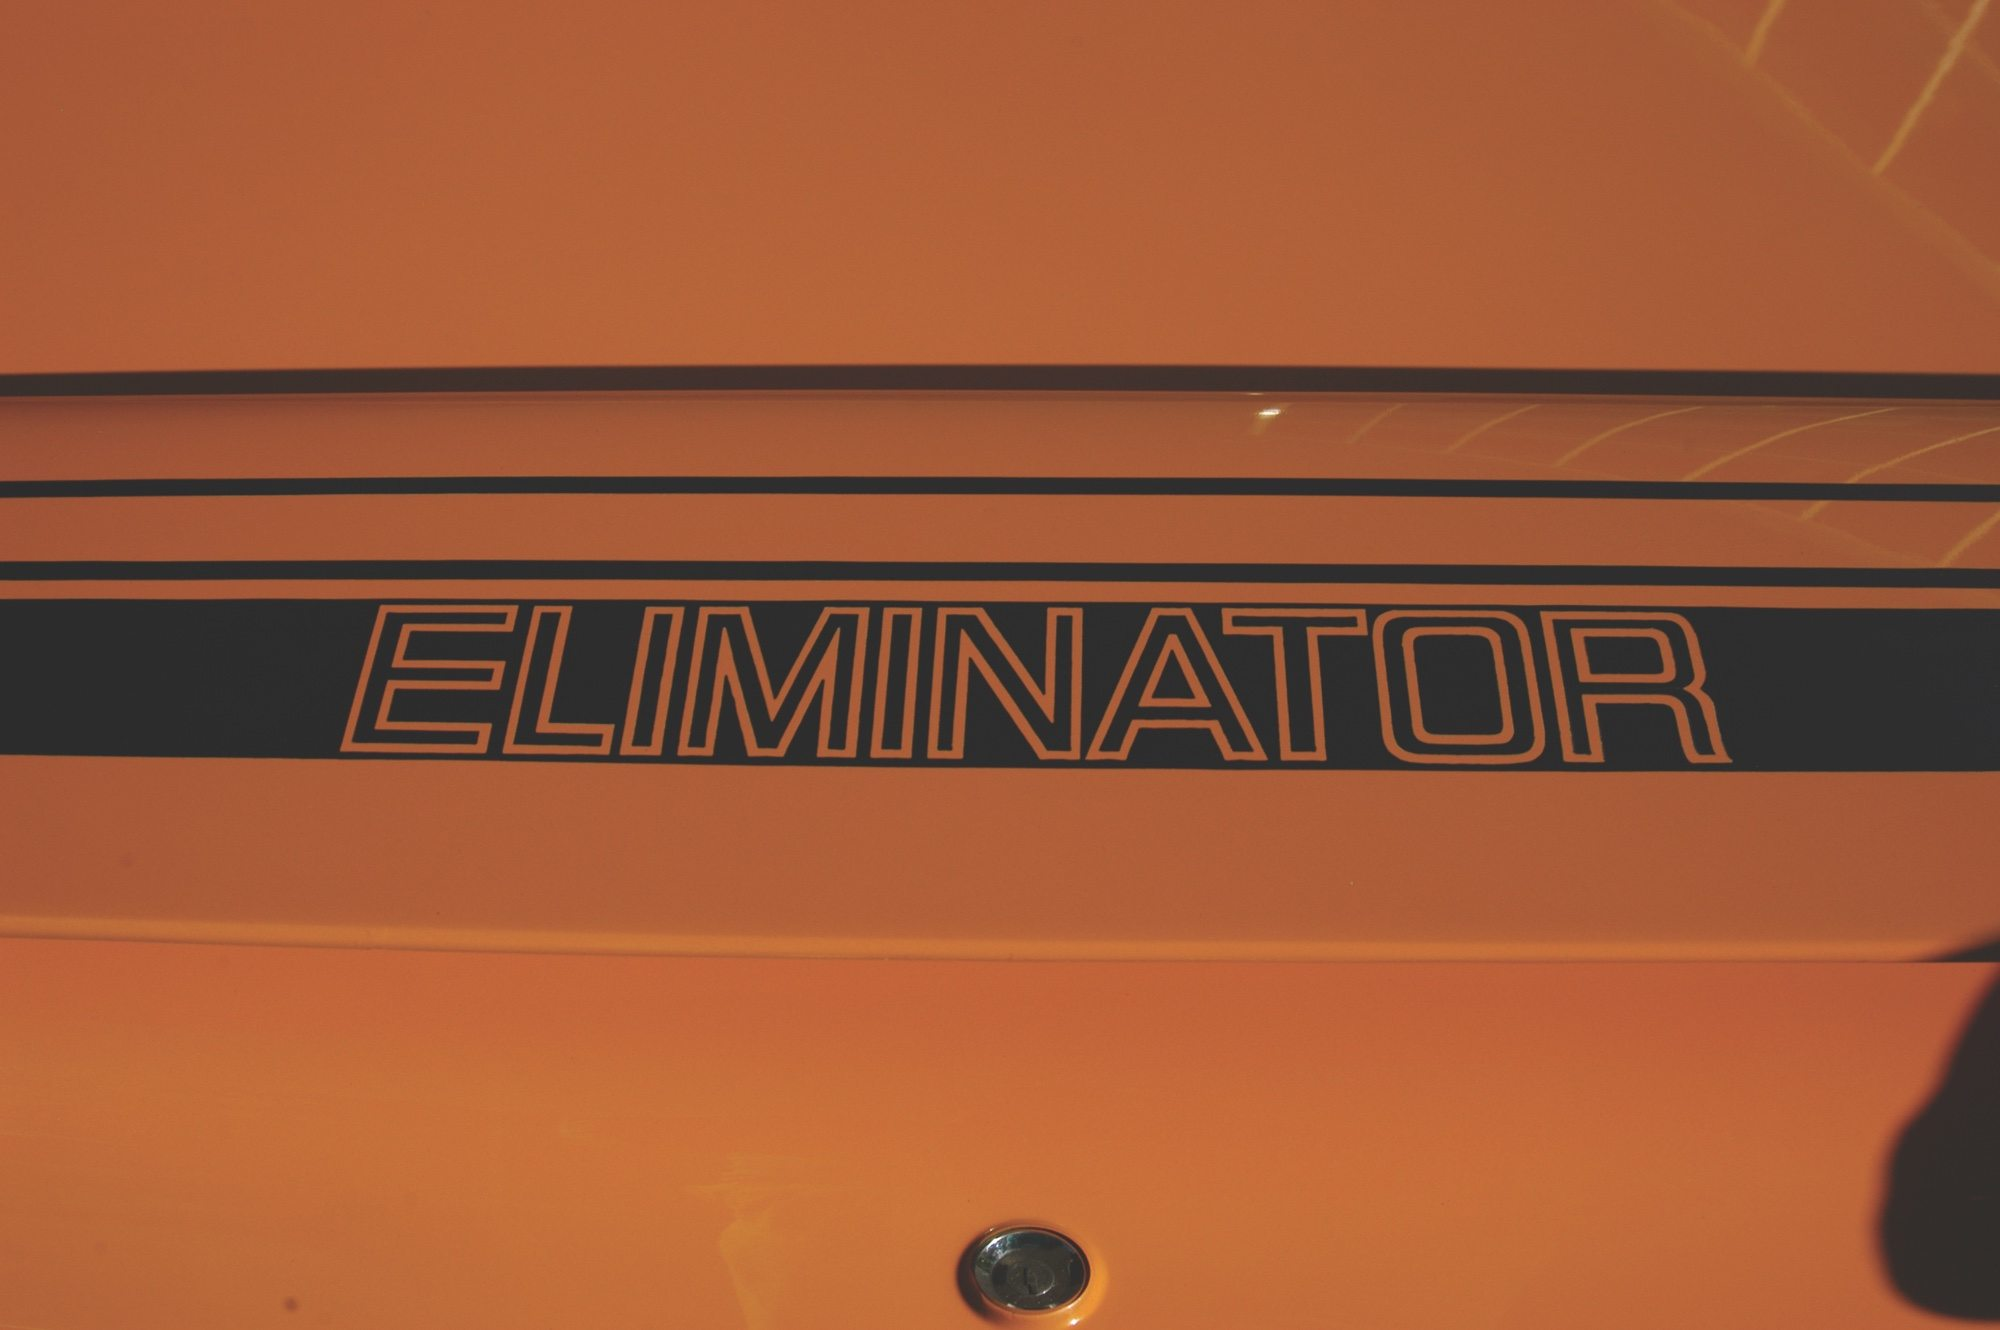 1970 Eliminator